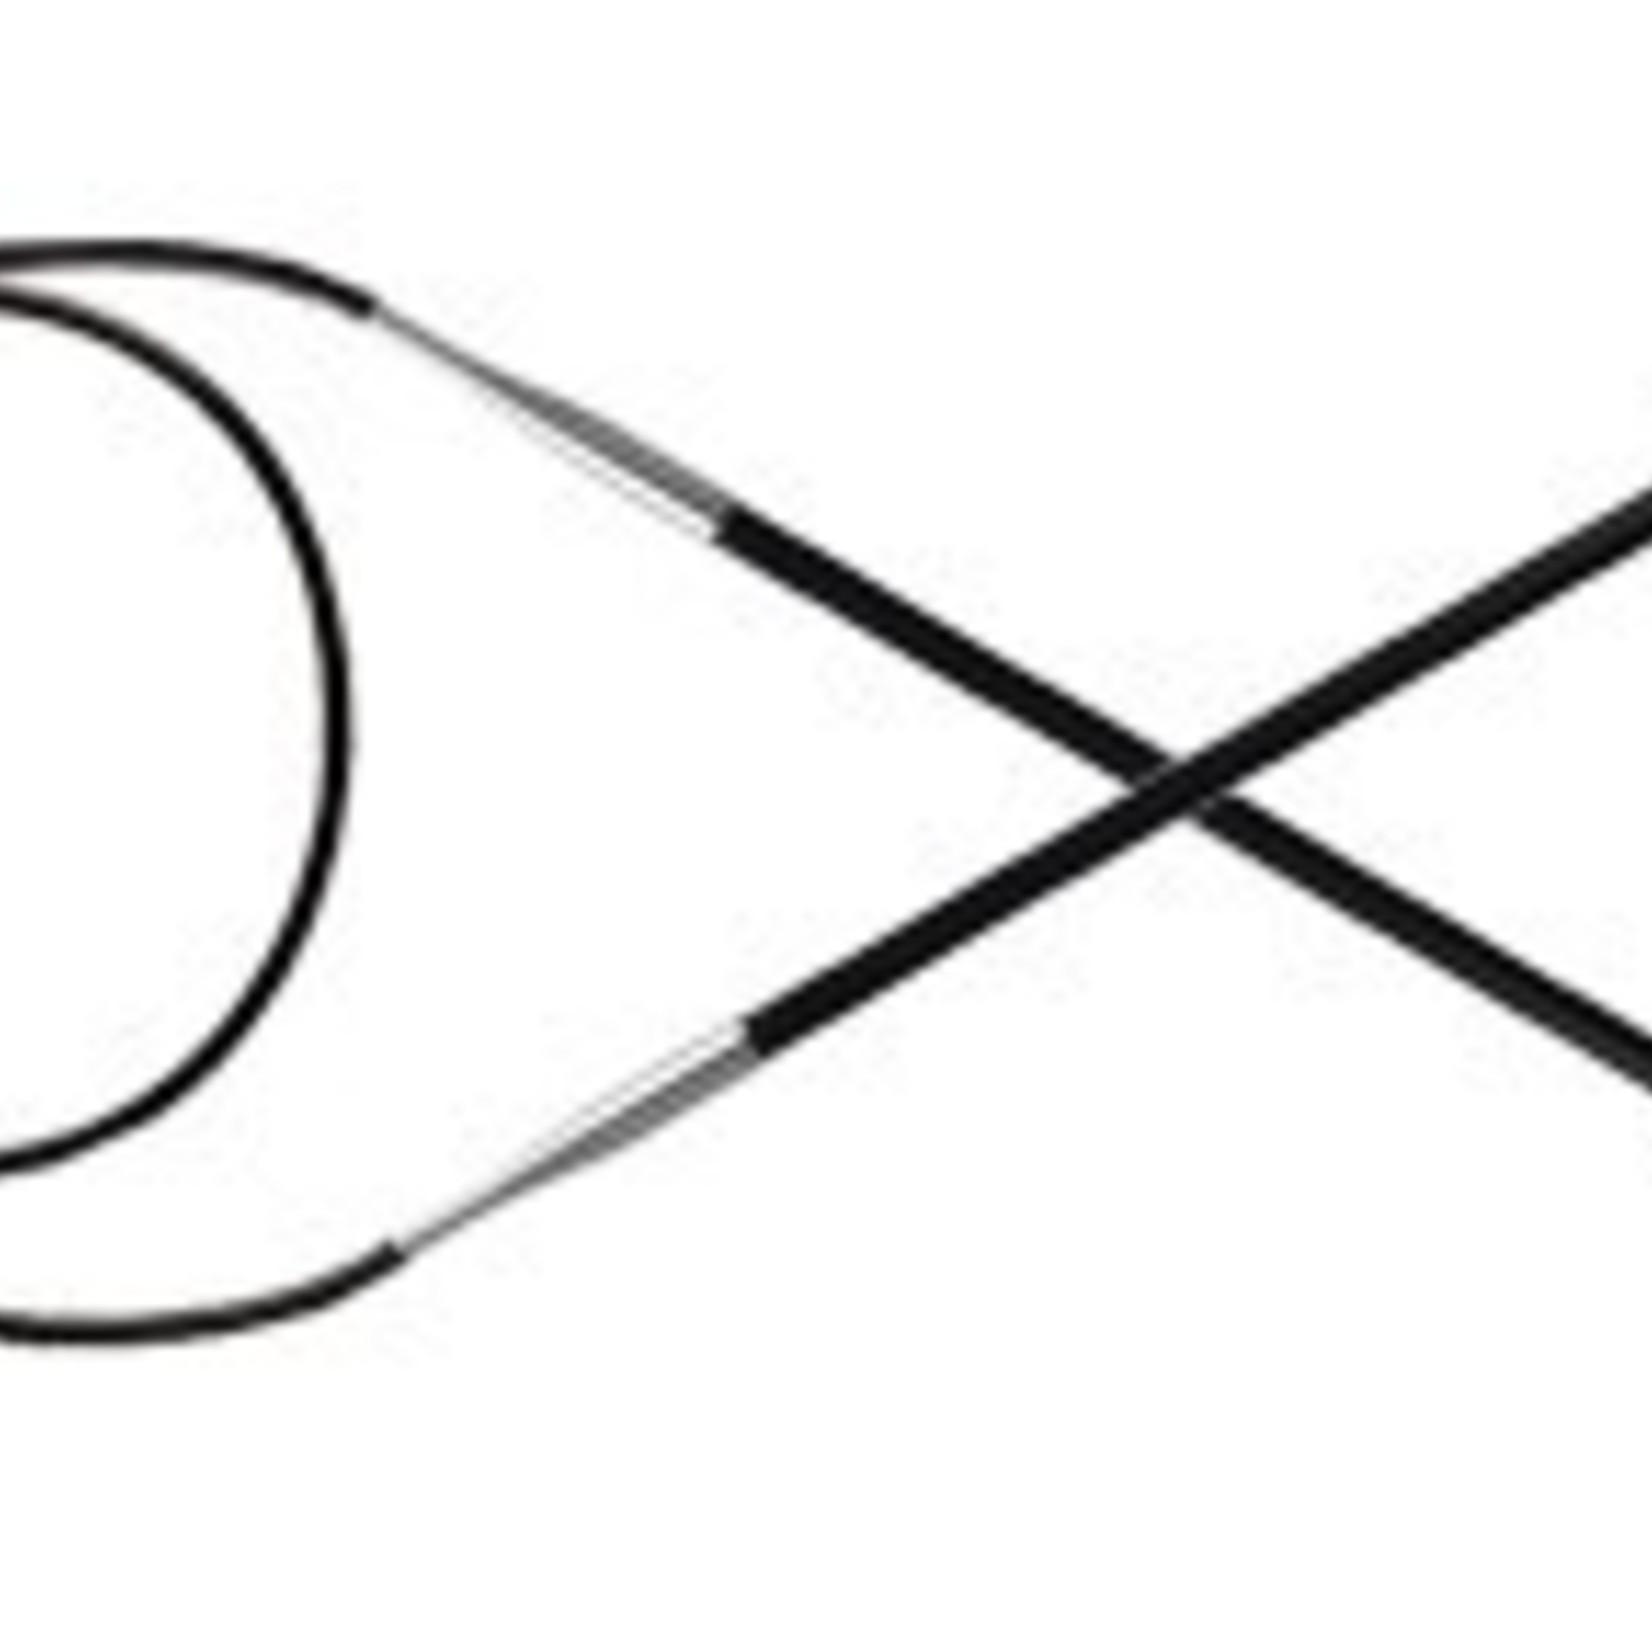 Knitter's Pride 3 Karbonz Circular 40